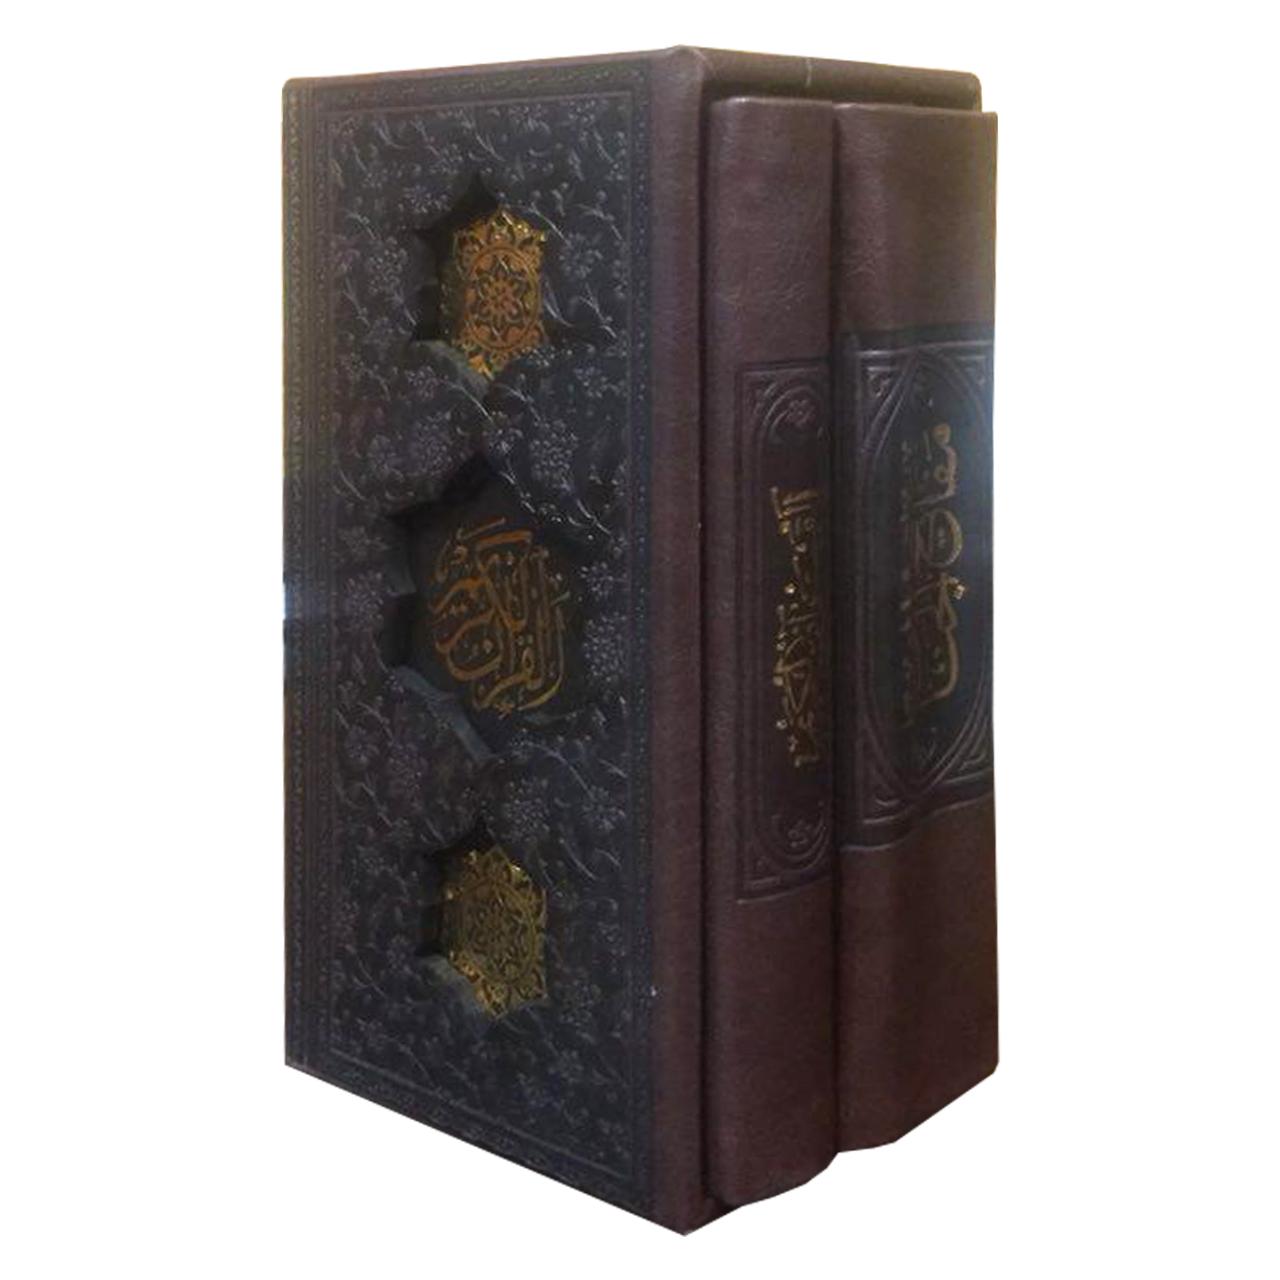 کتاب قرآن کریم و مفاتیح الجنان 2جلدی